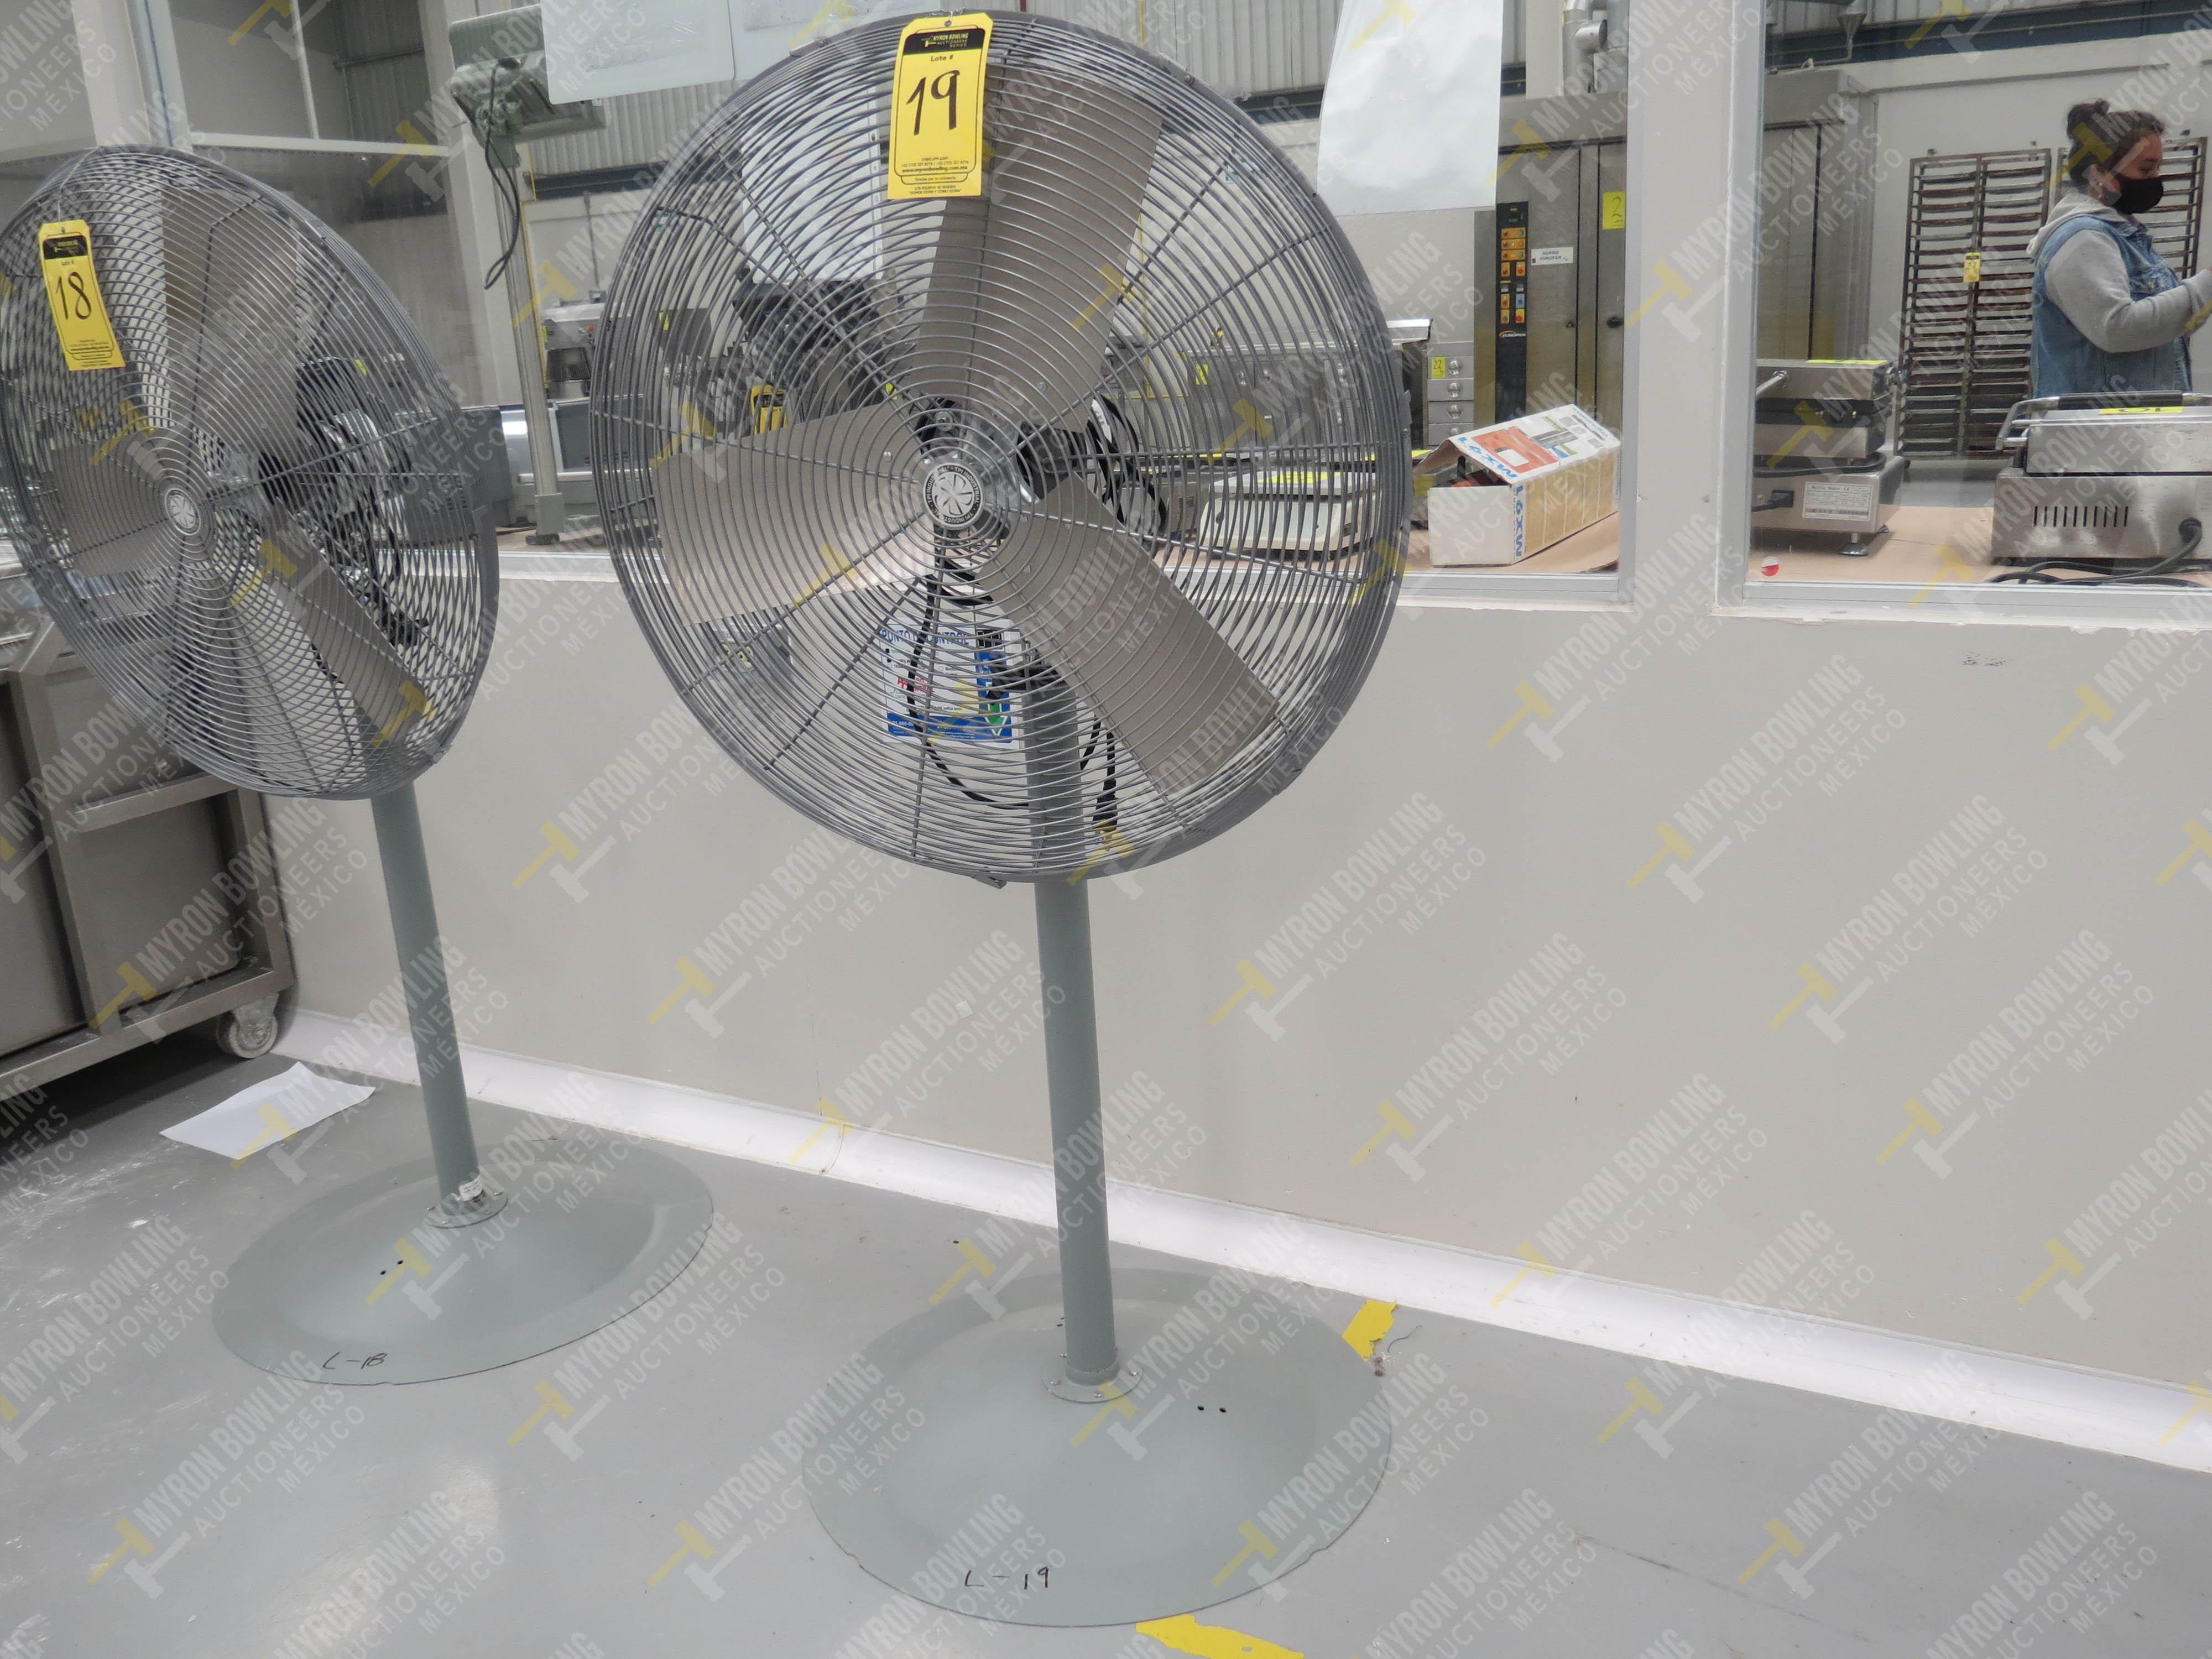 Ventilador de pedestal de 80 cm de diámetro marca TPI Industrial, Modelo CK48HF12JS26, … - Image 2 of 4